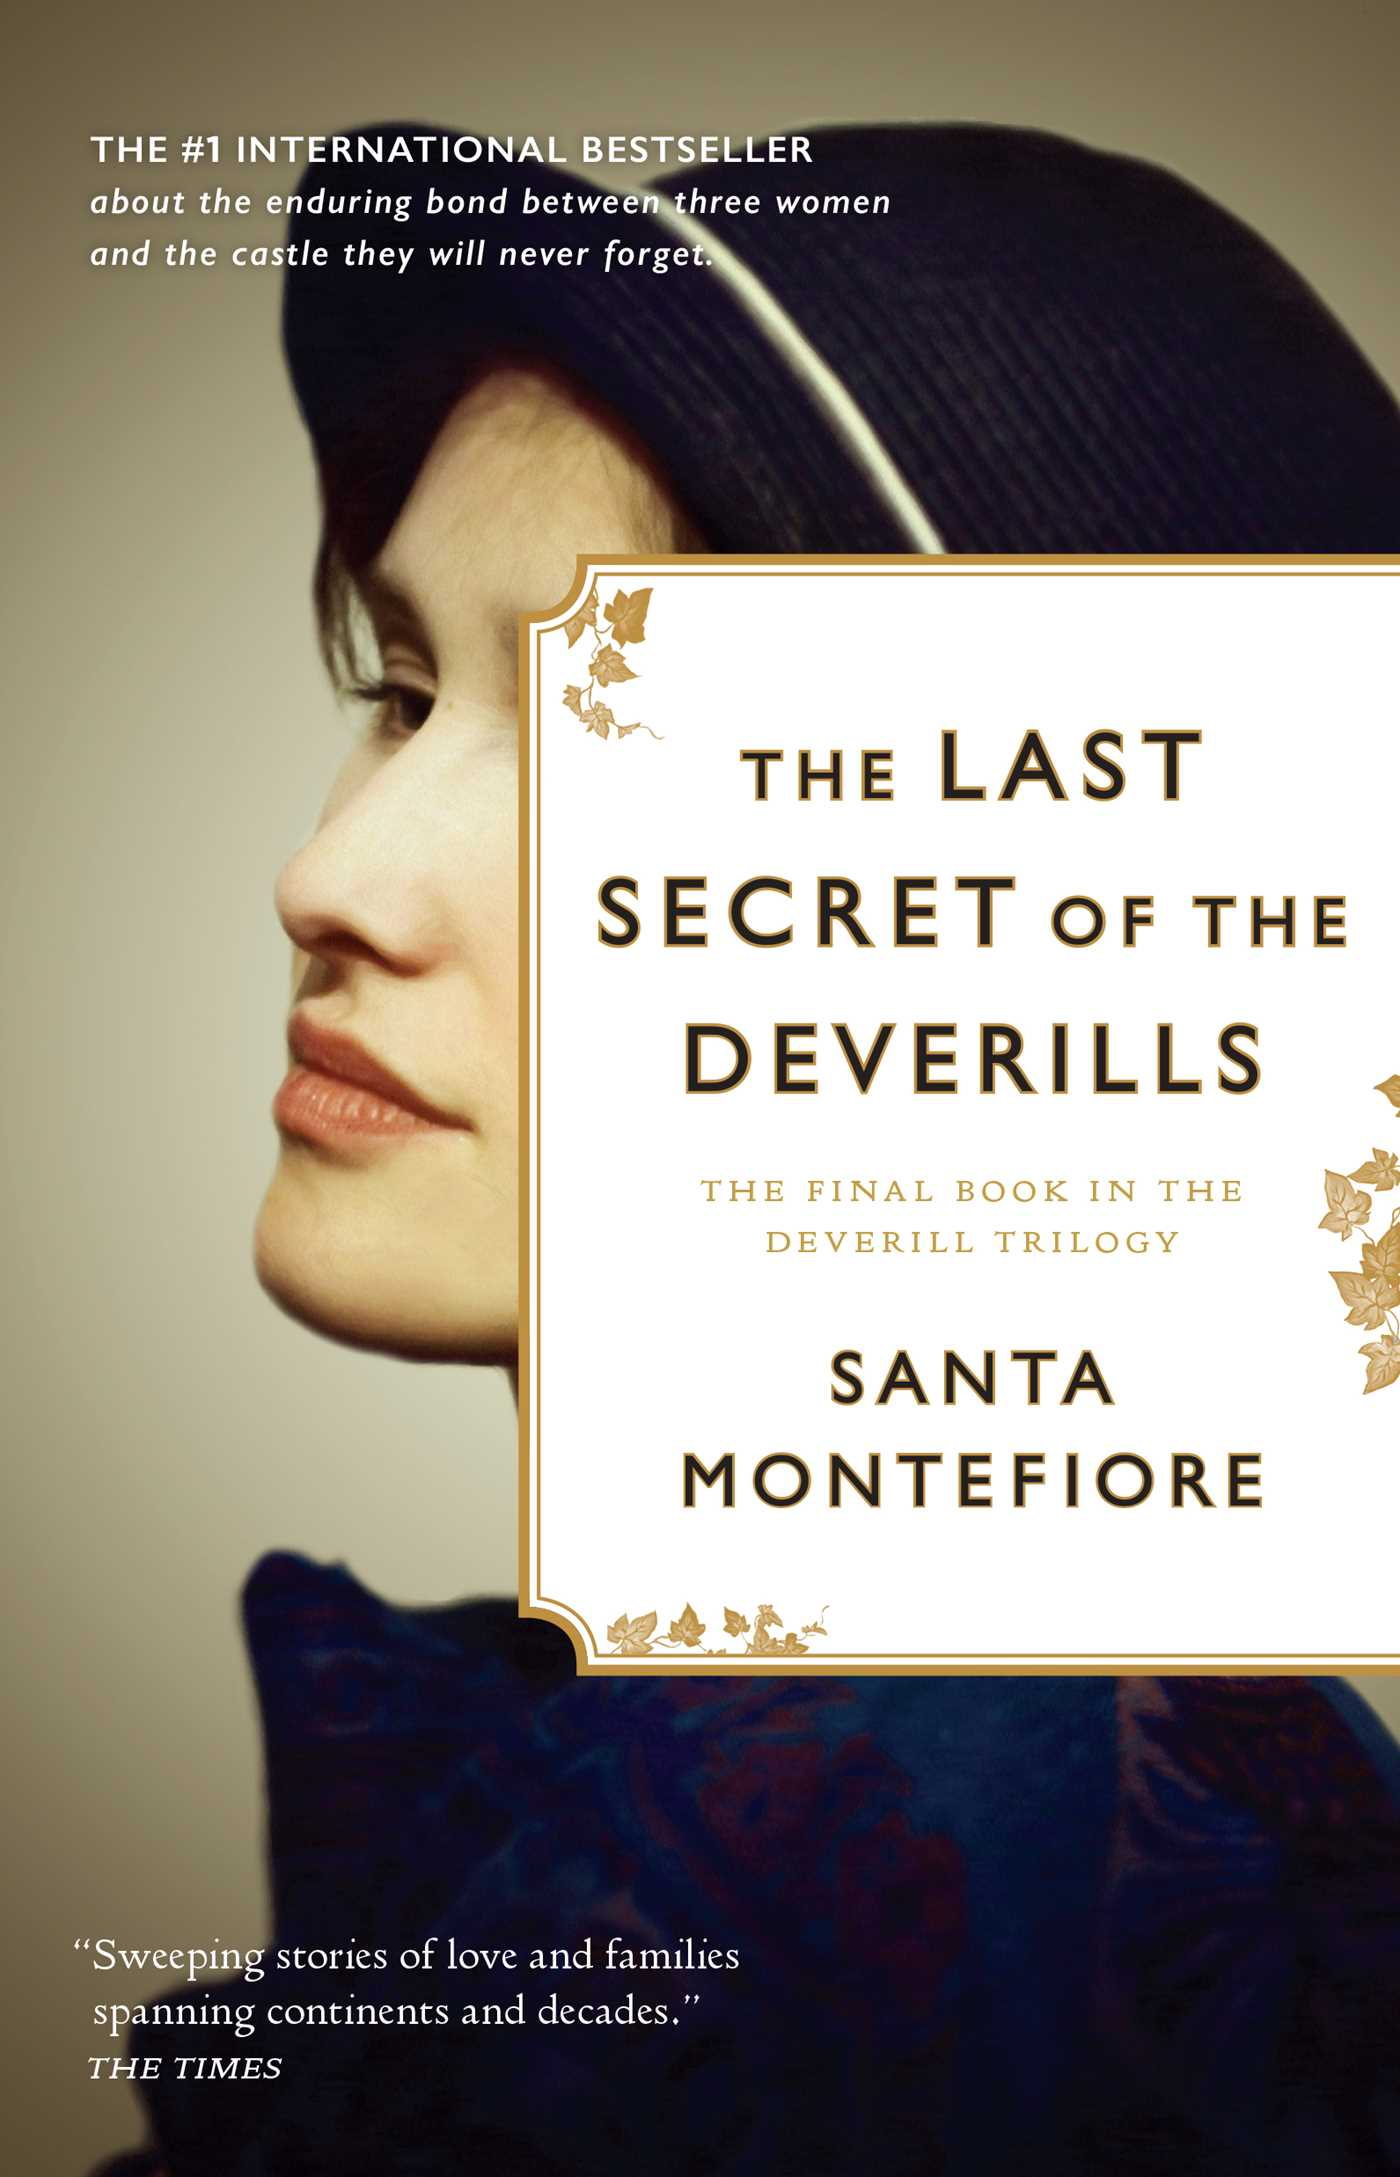 The last secret of the deverills 9781471172373 hr